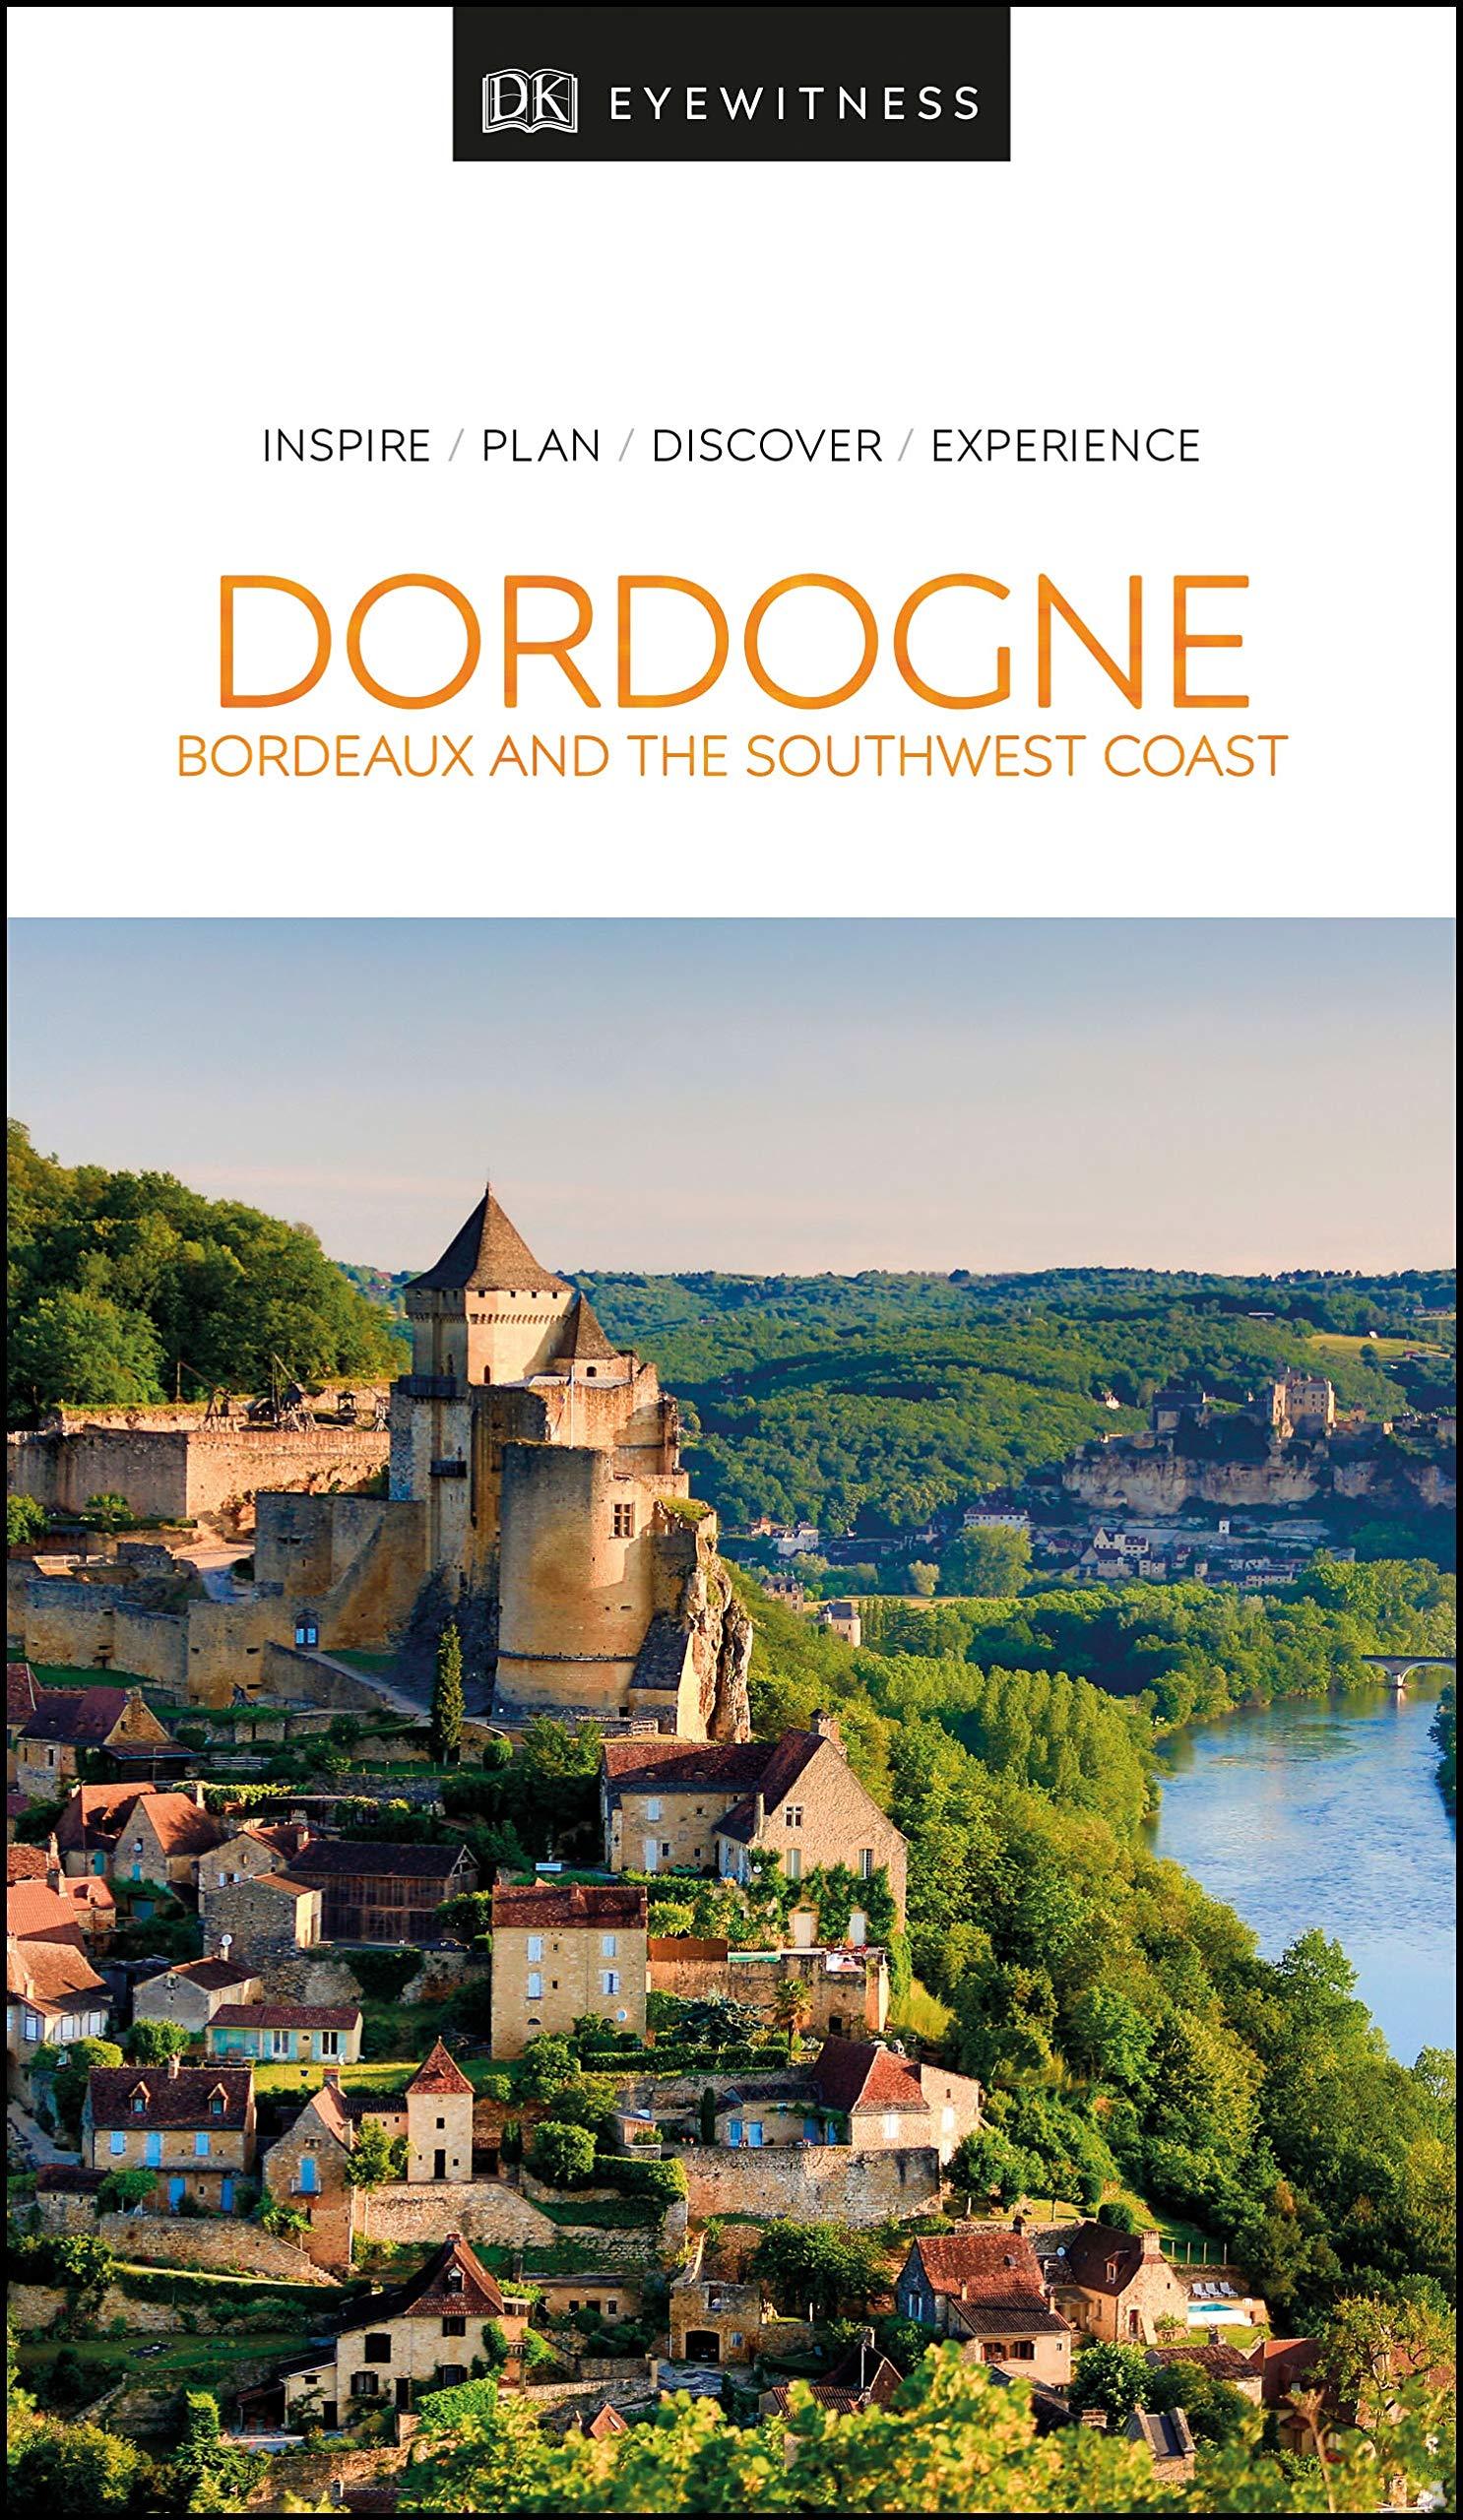 DK Eyewitness Dordogne, Bordeaux and the Southwest Coast (Travel Guide)